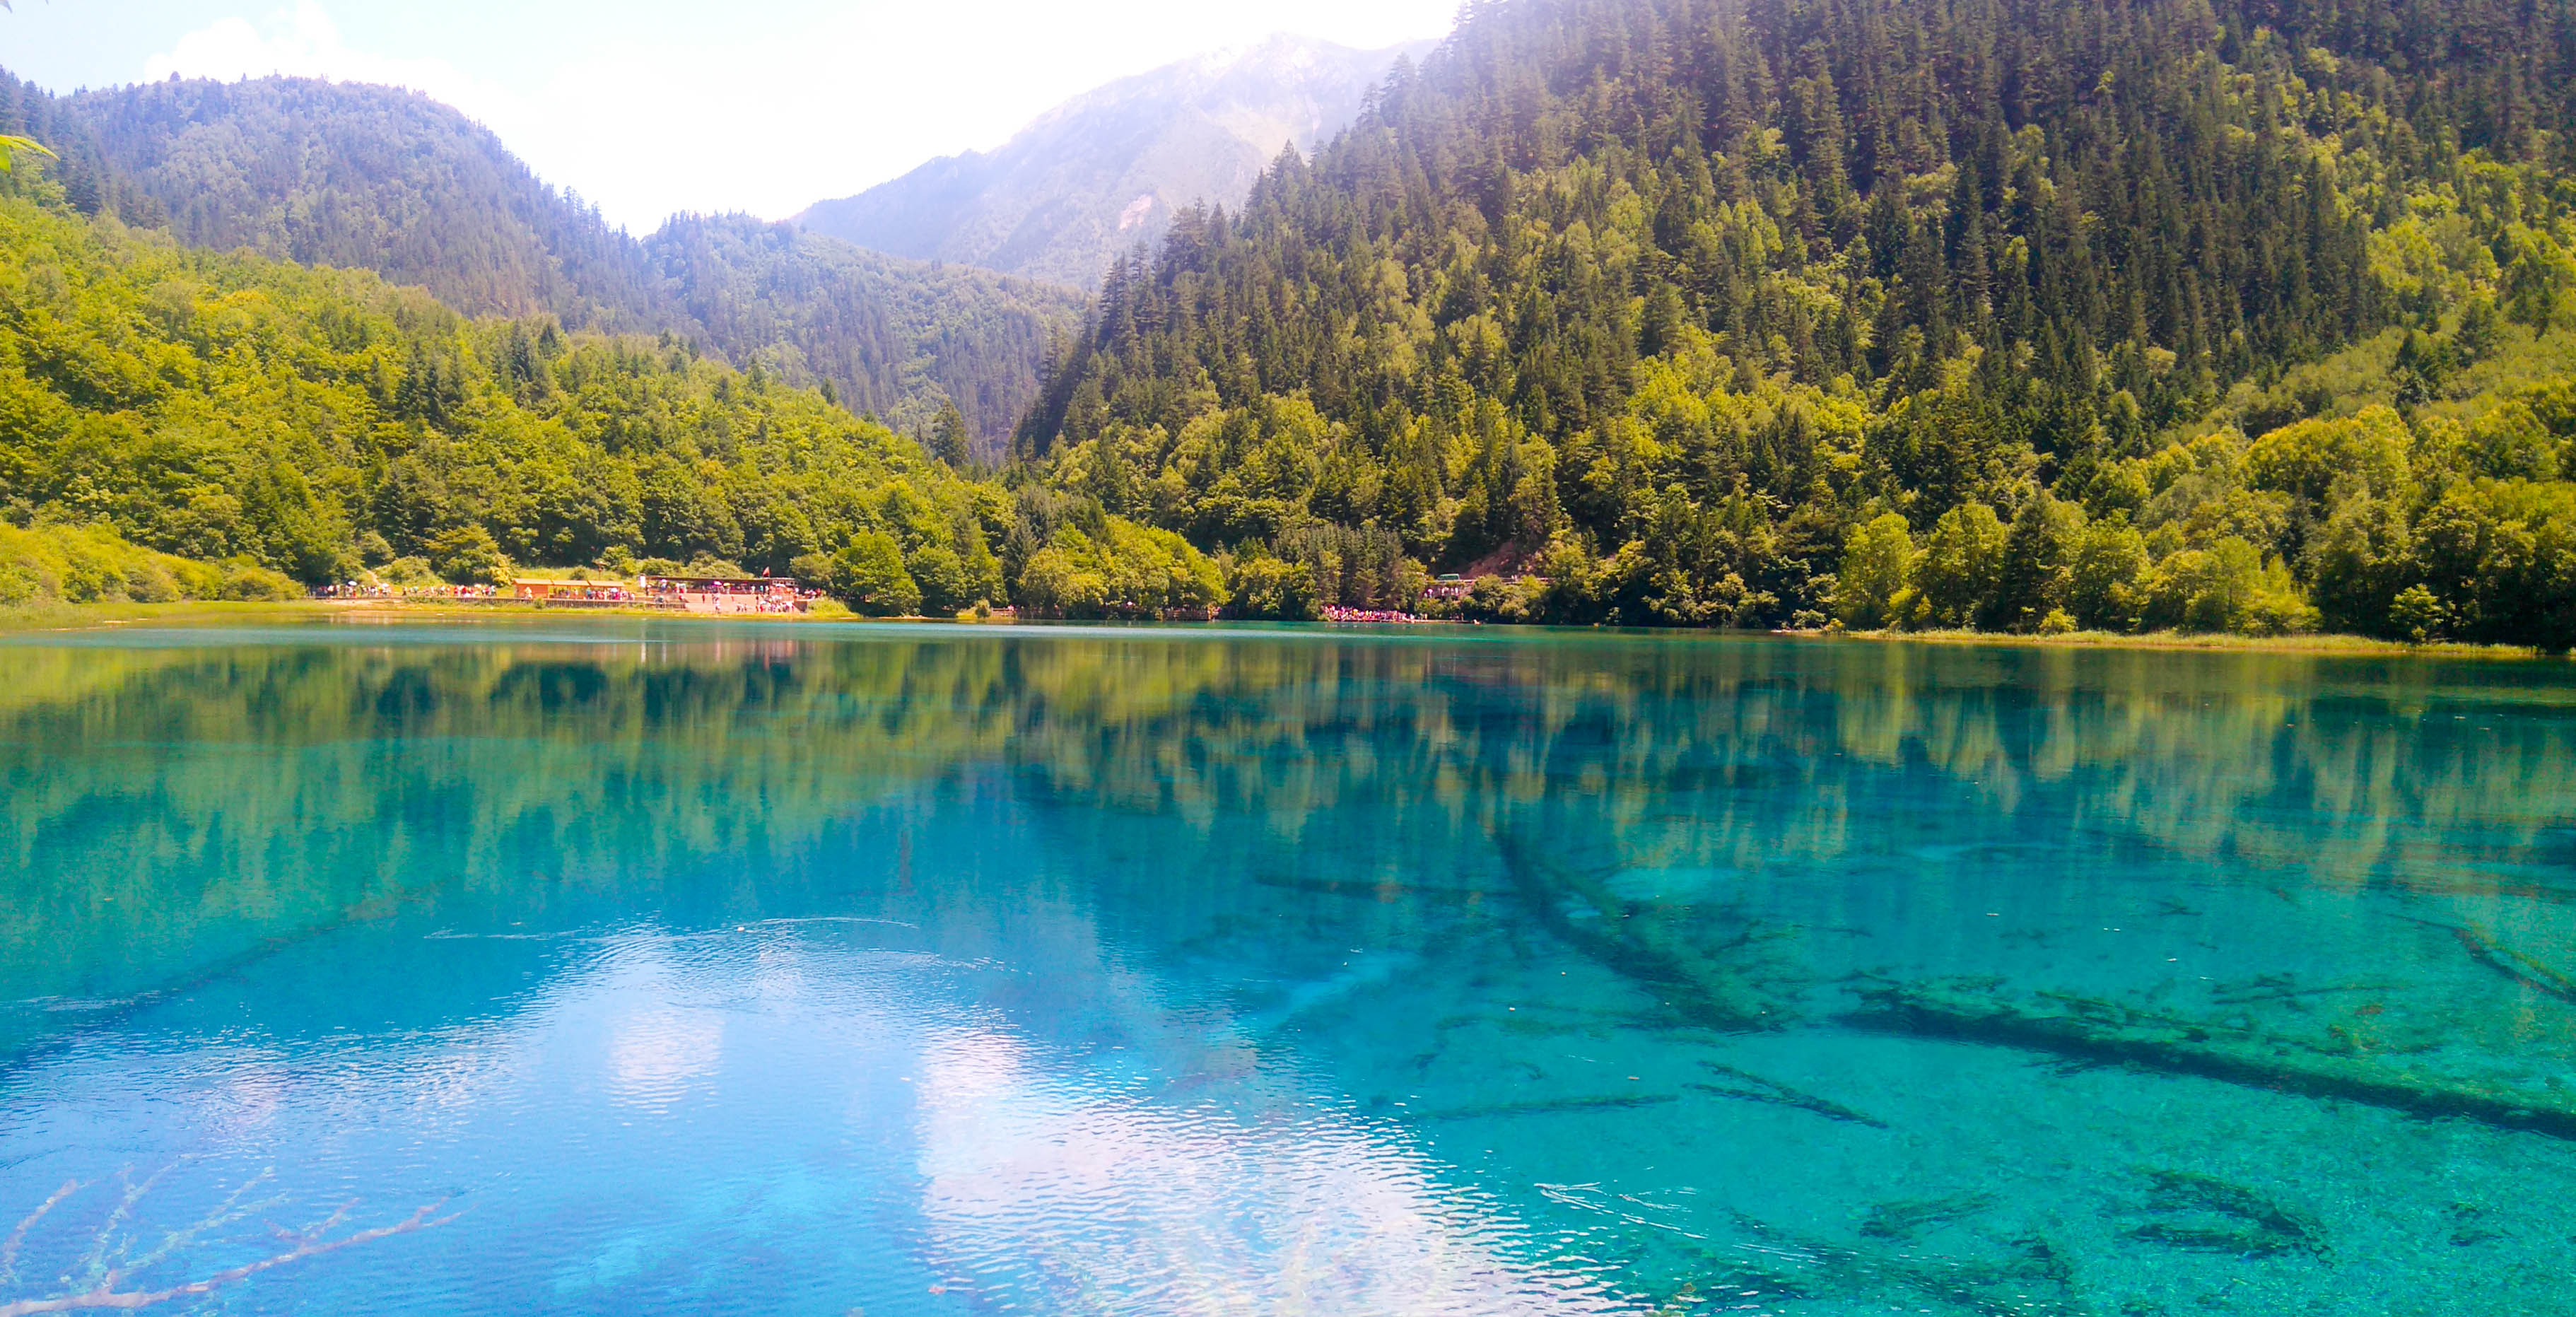 Visiting Jiuzhaigou A Magical Valley On The Edge Of The